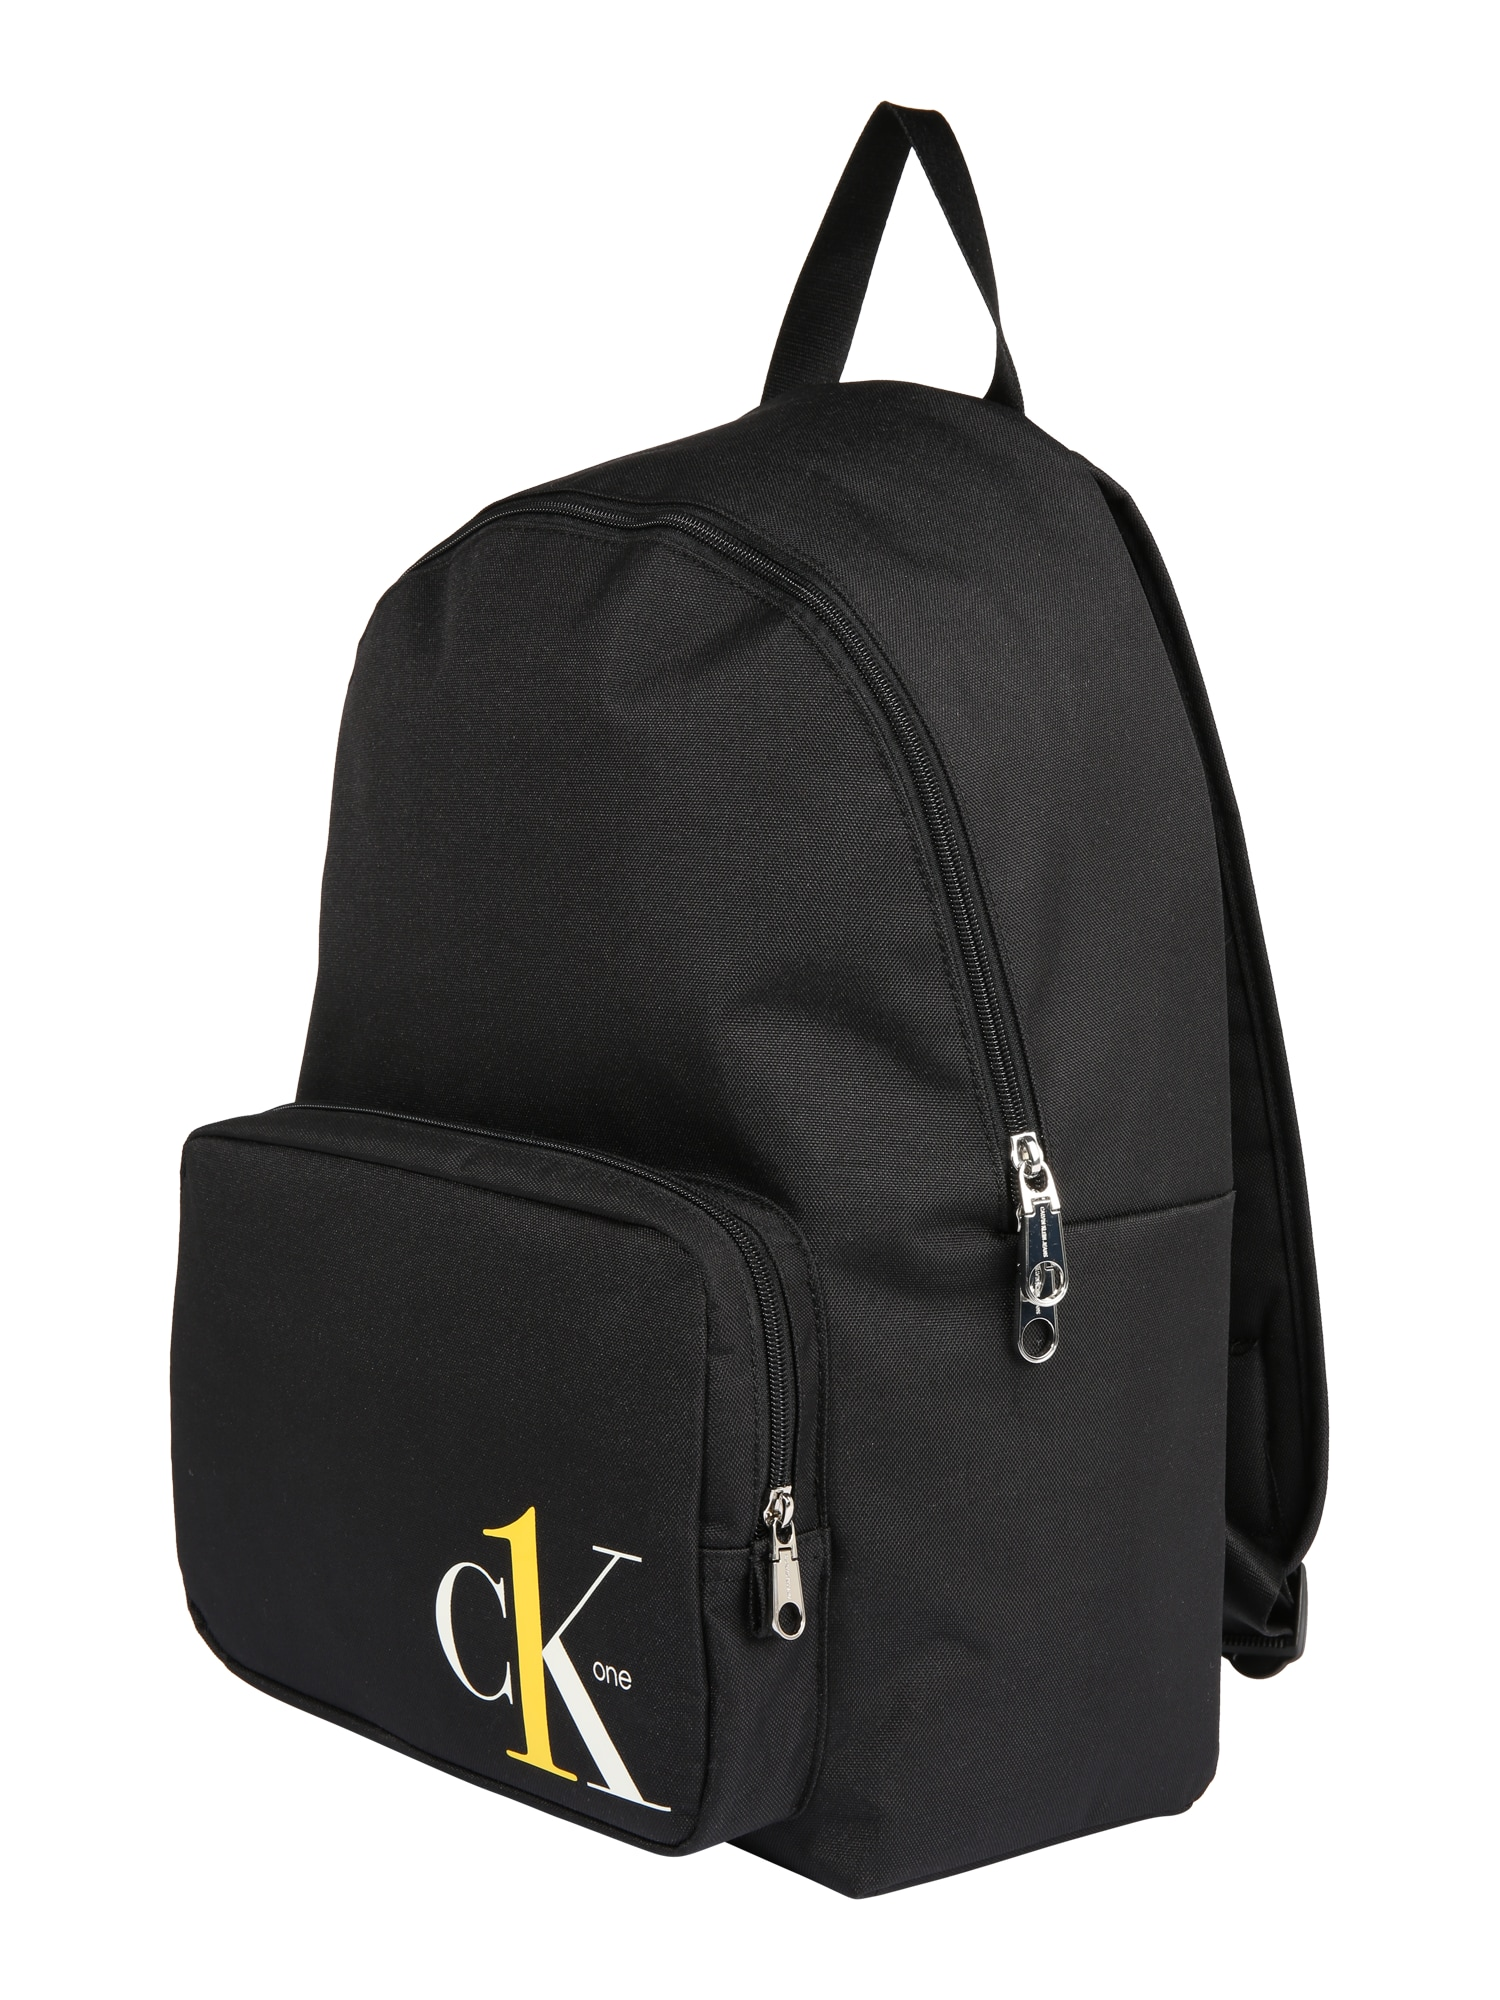 Calvin Klein Jeans Kuprinė 'CK1 CAMPUS BP45' balta / juoda / geltona